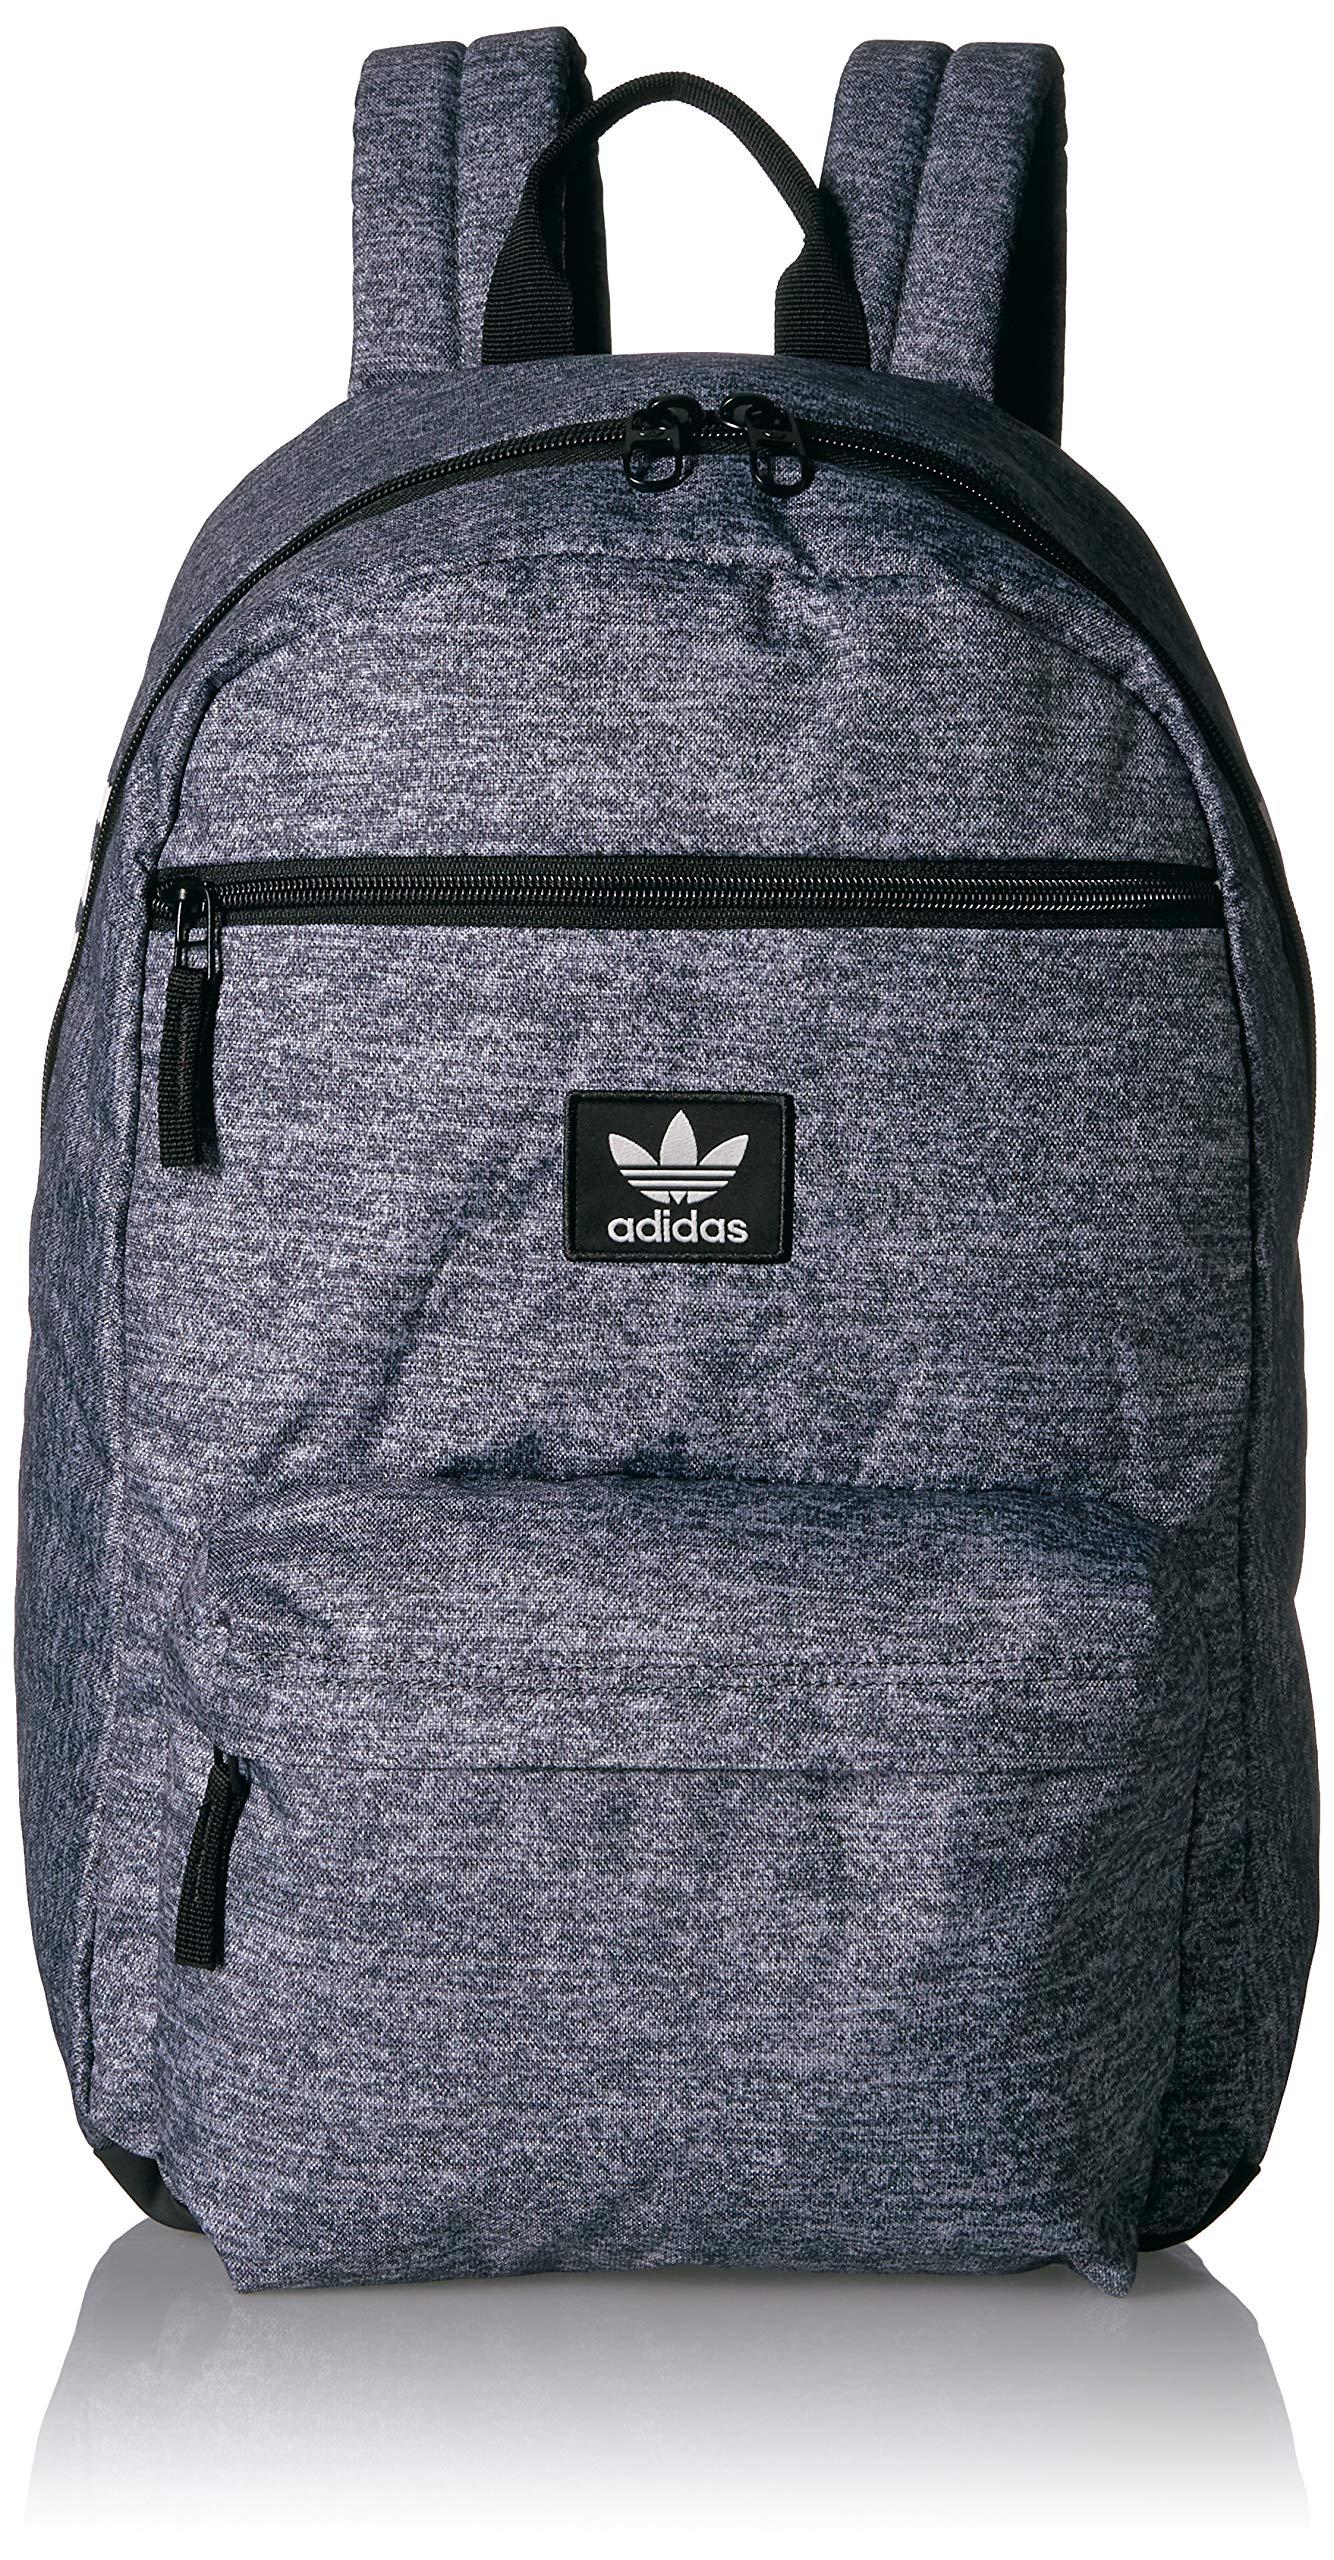 adidas Originals National Backpack Heather